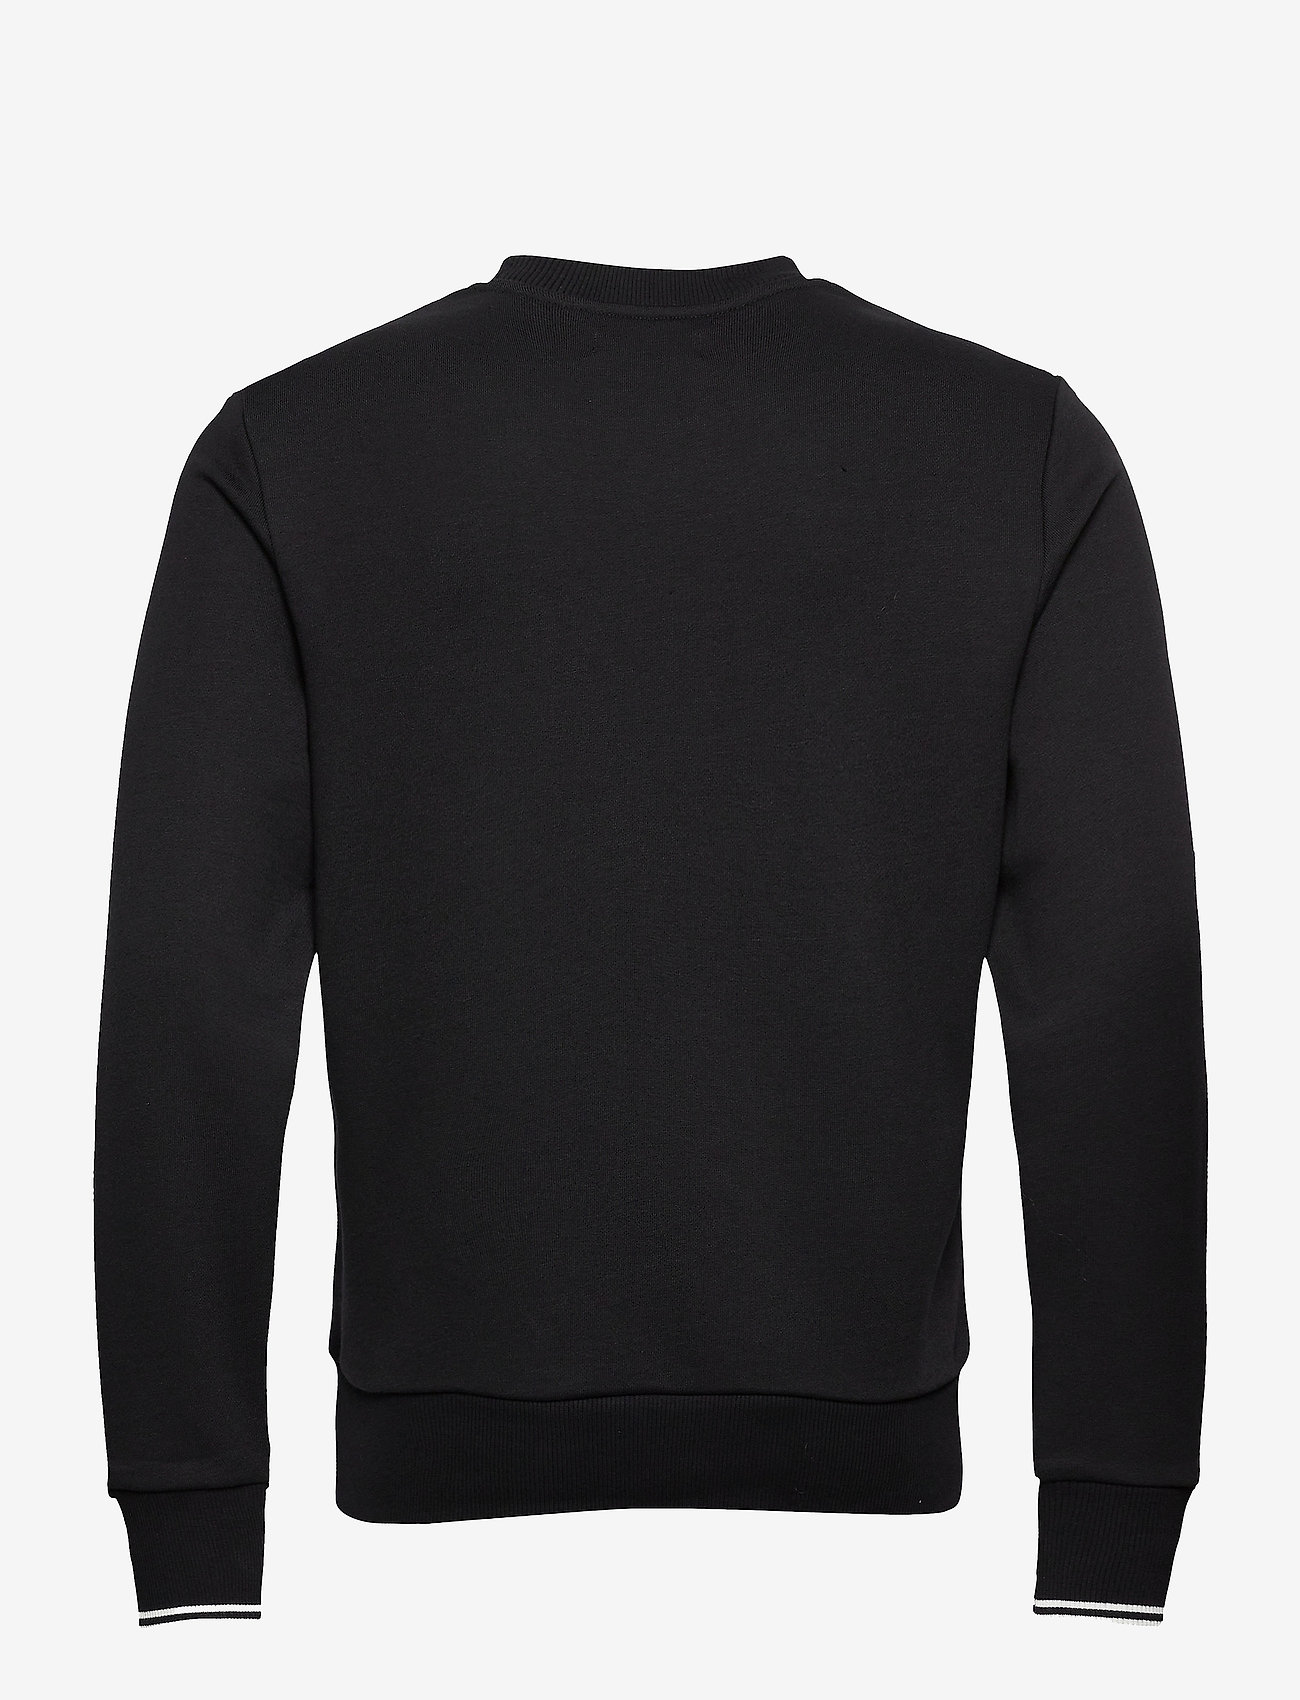 Fred Perry CREW NECK SWEATSHIRT - Sweatshirts BLACK - Menn Klær